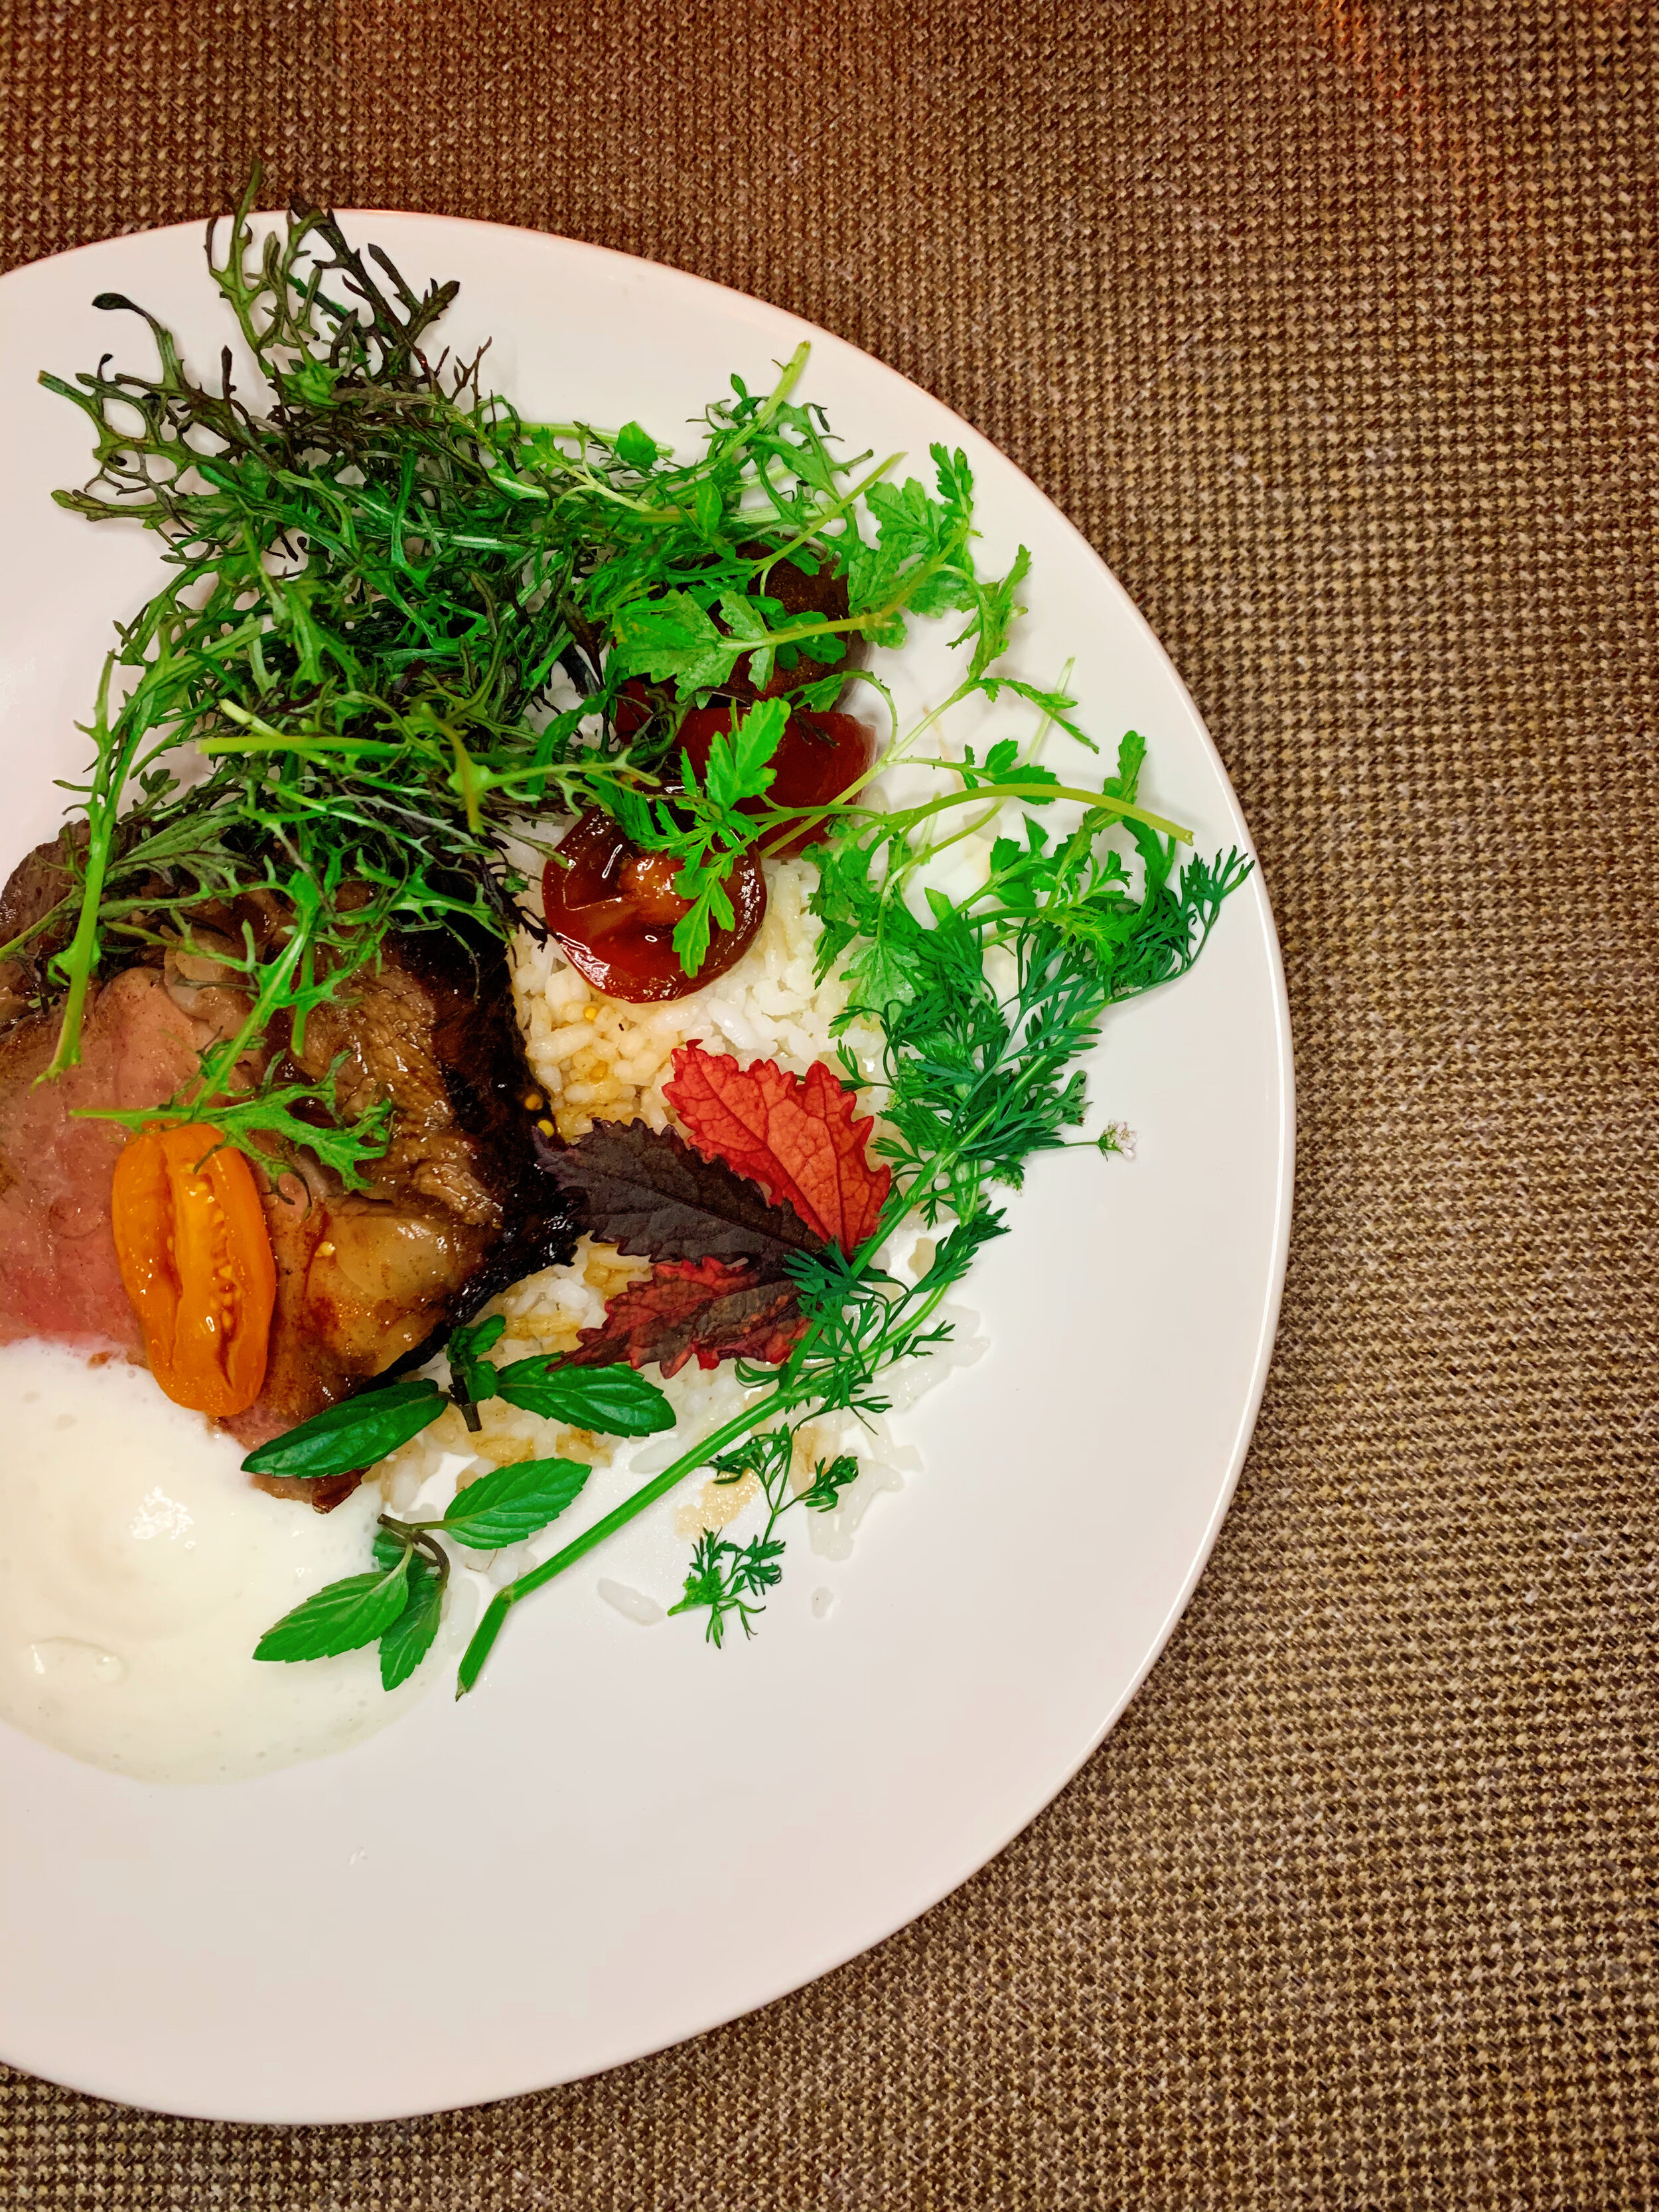 E3 Short Rib | Black Soy + Sunflower Seed Miso + Fragrant Herbs+ Reggiano Sabayon + Carolina Gold Rice